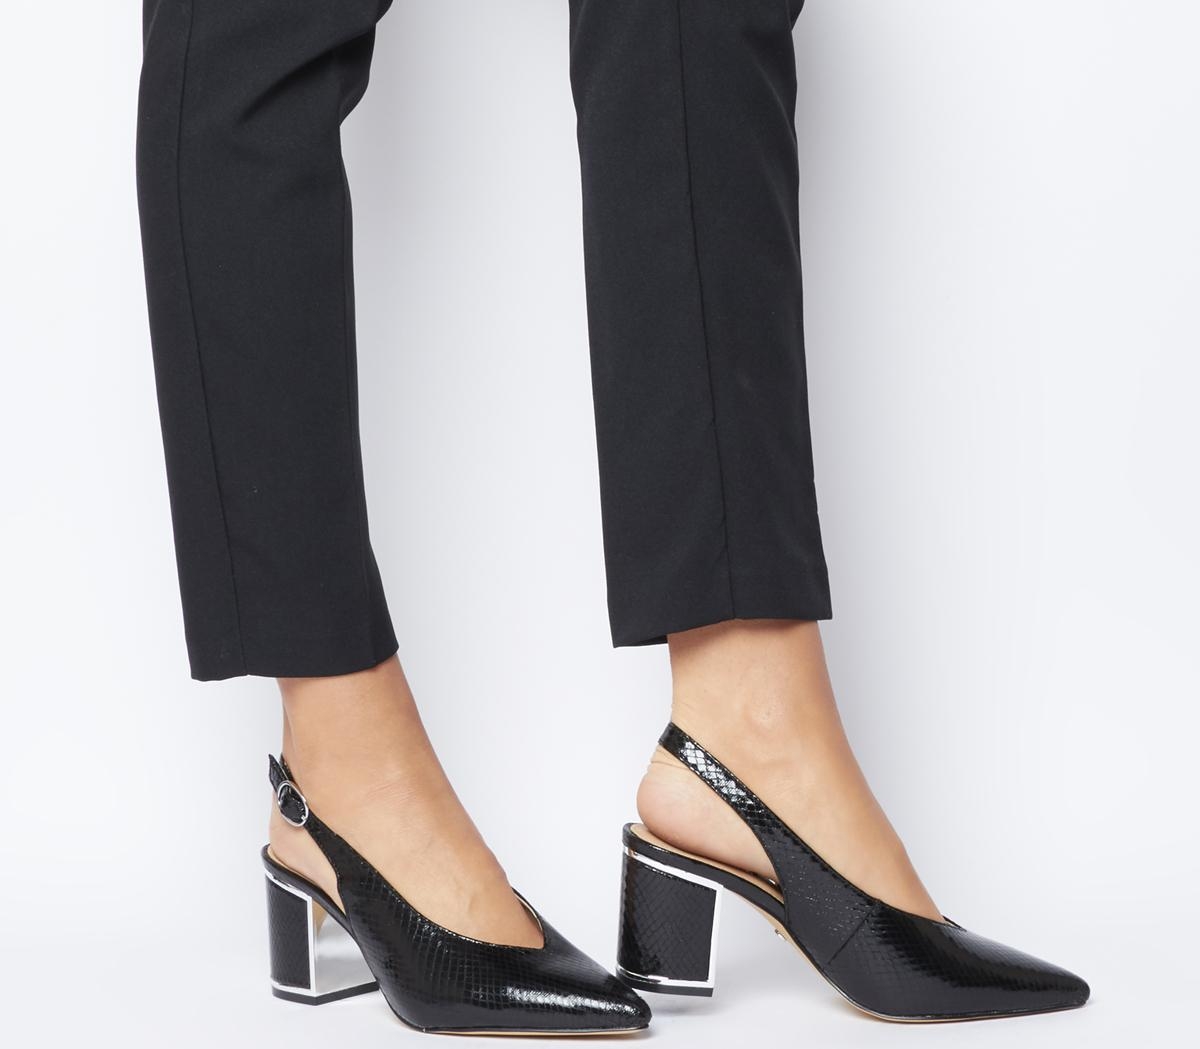 animal print slingback heels